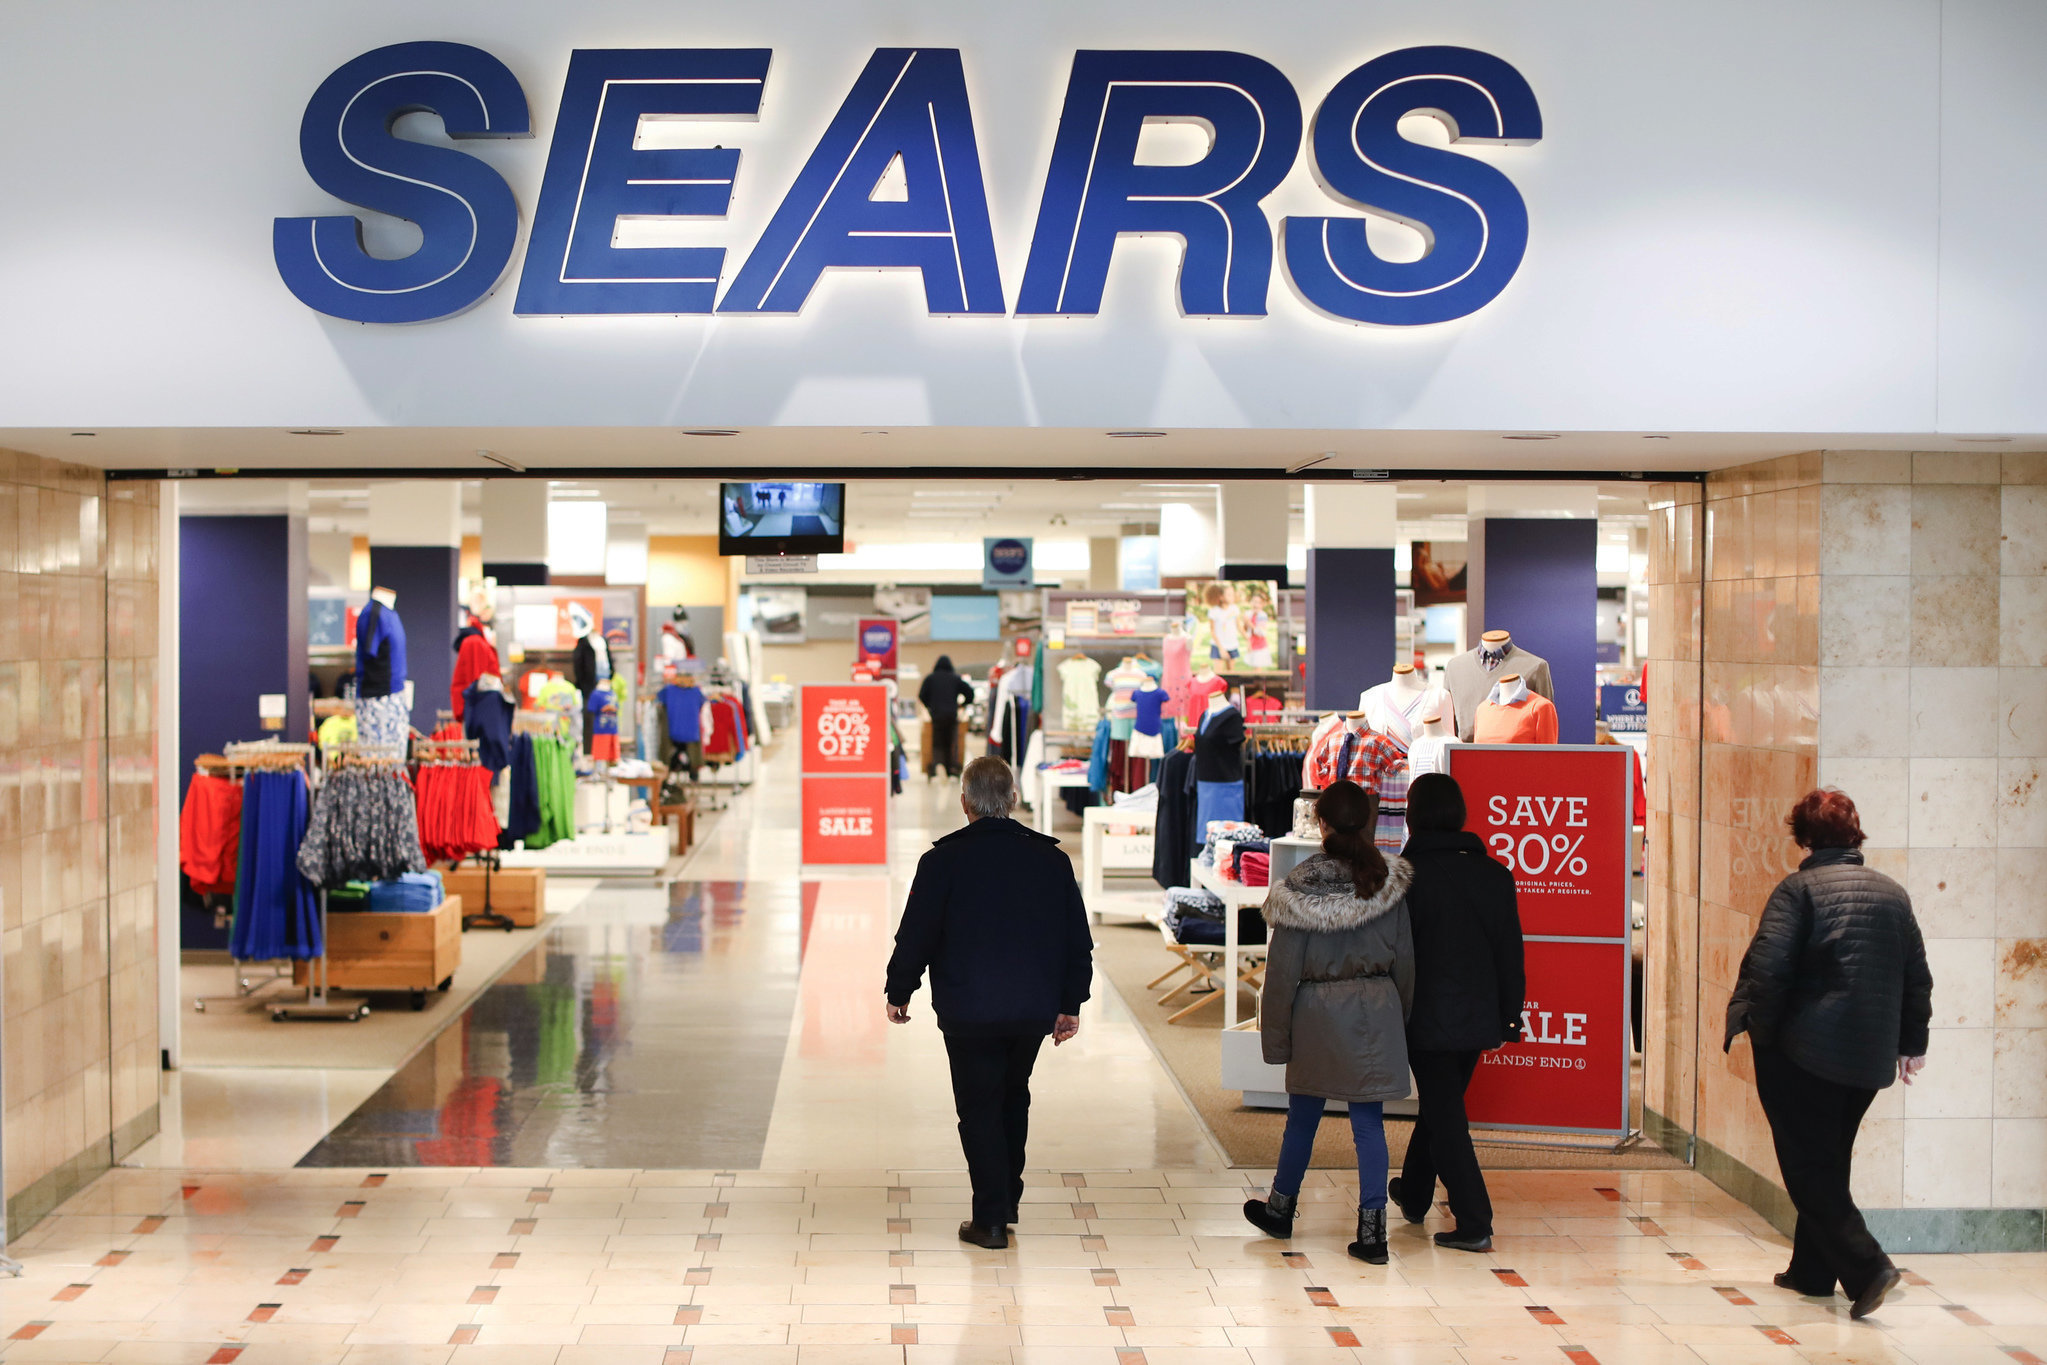 Sears to close dozens of stores across US | OregonLive.com